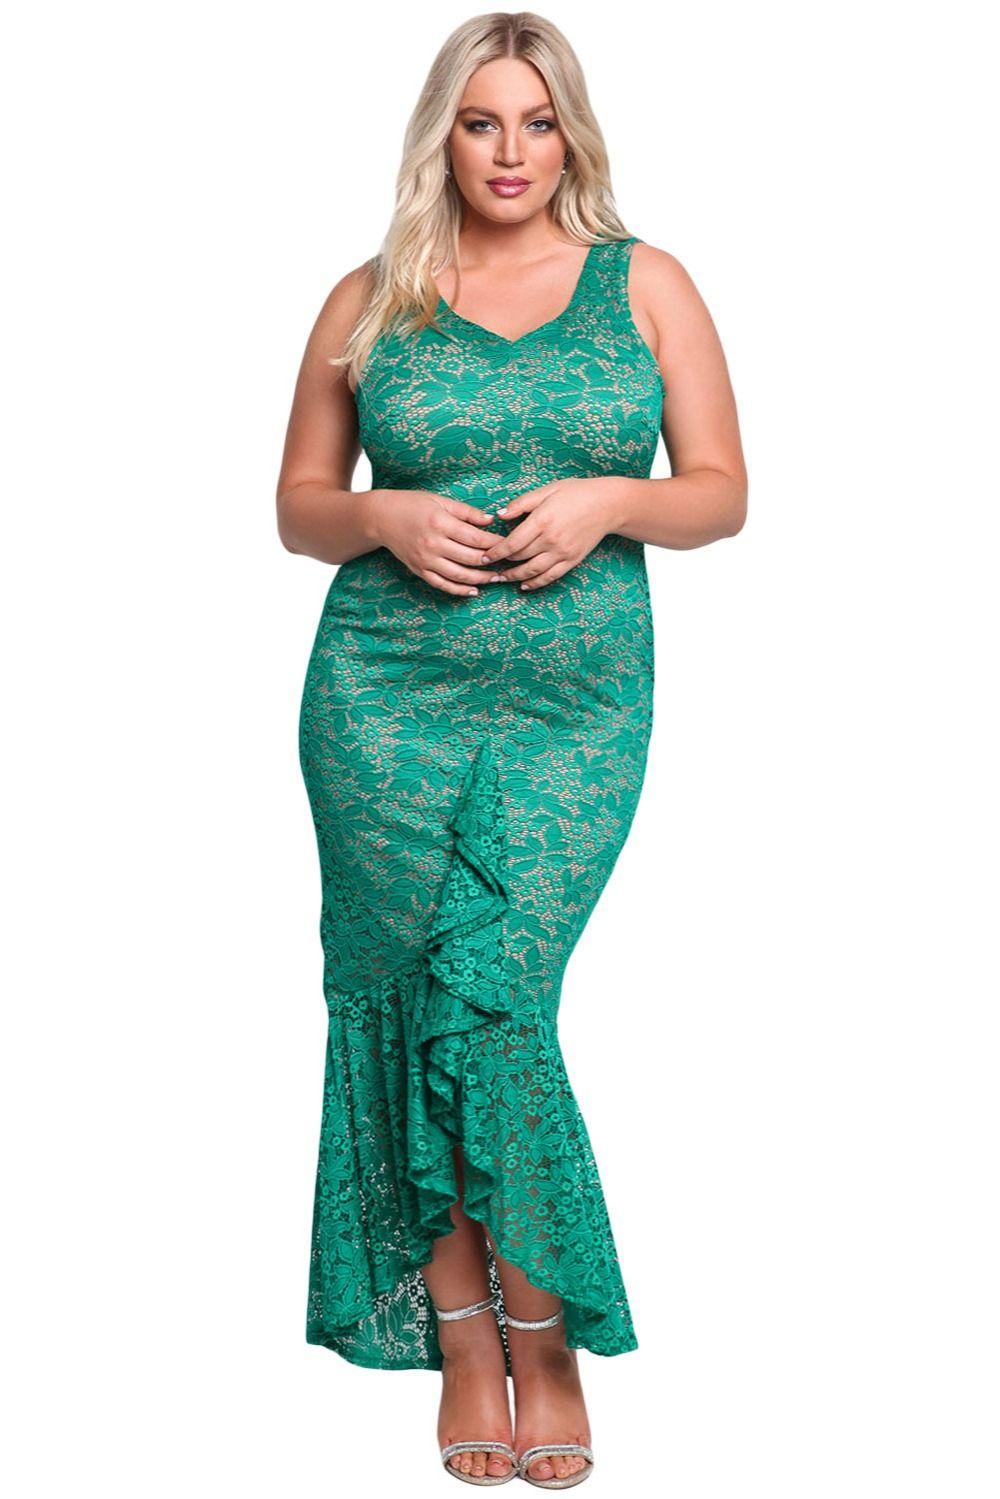 Elegant Mermaid Large Size White Lace Dress XL Sexy Plus Size ...